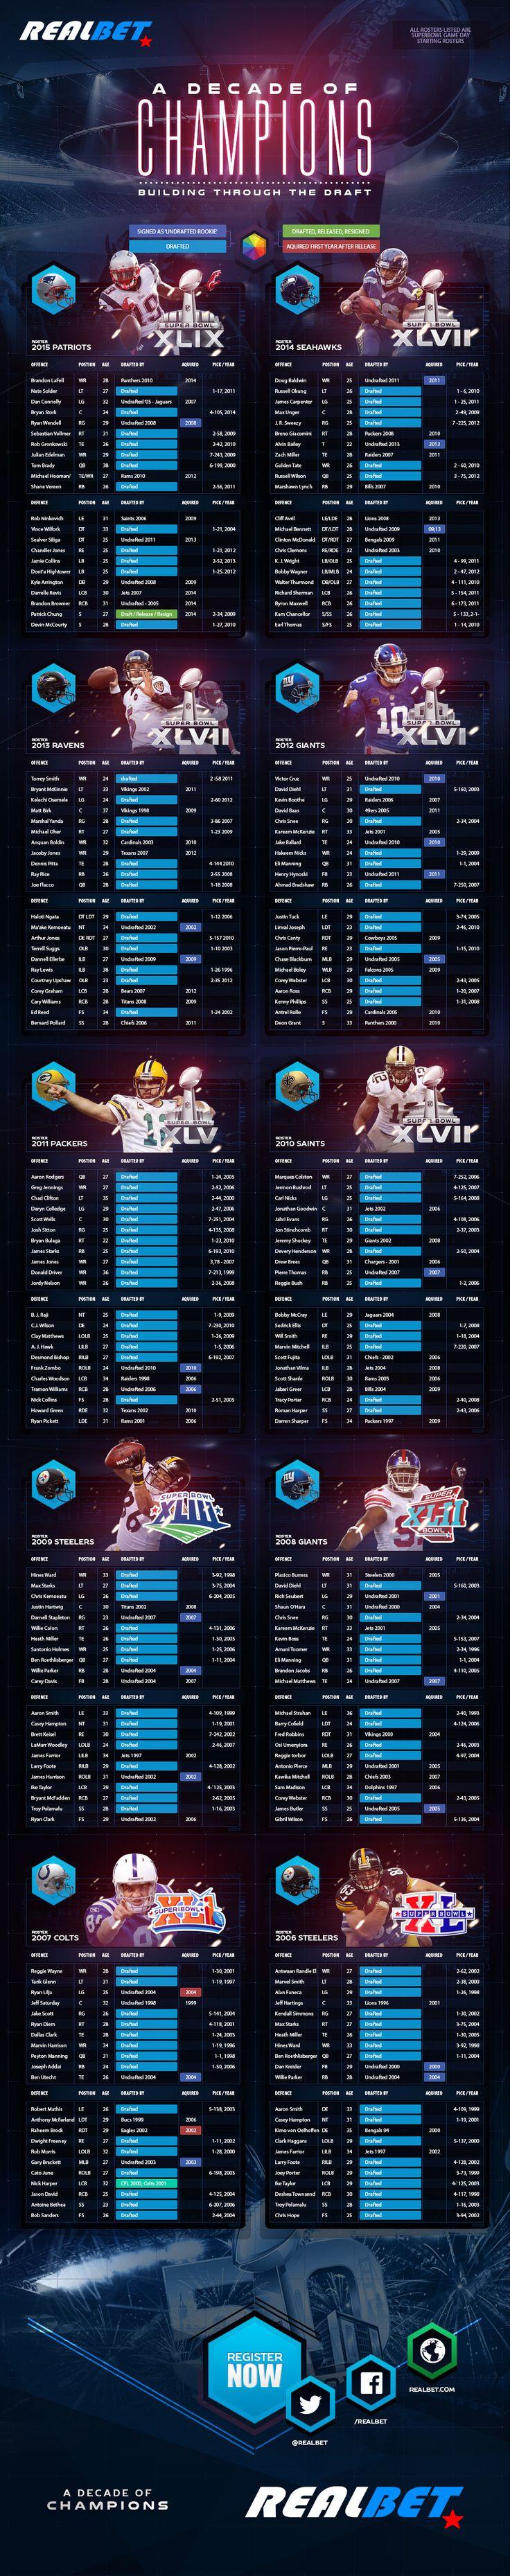 NFL / Superbowl Betting Strategy Infographic & Team Draft Picks 2015 #superbowl #football #beting #sports #sportsbetting #realbet.eu #nfl